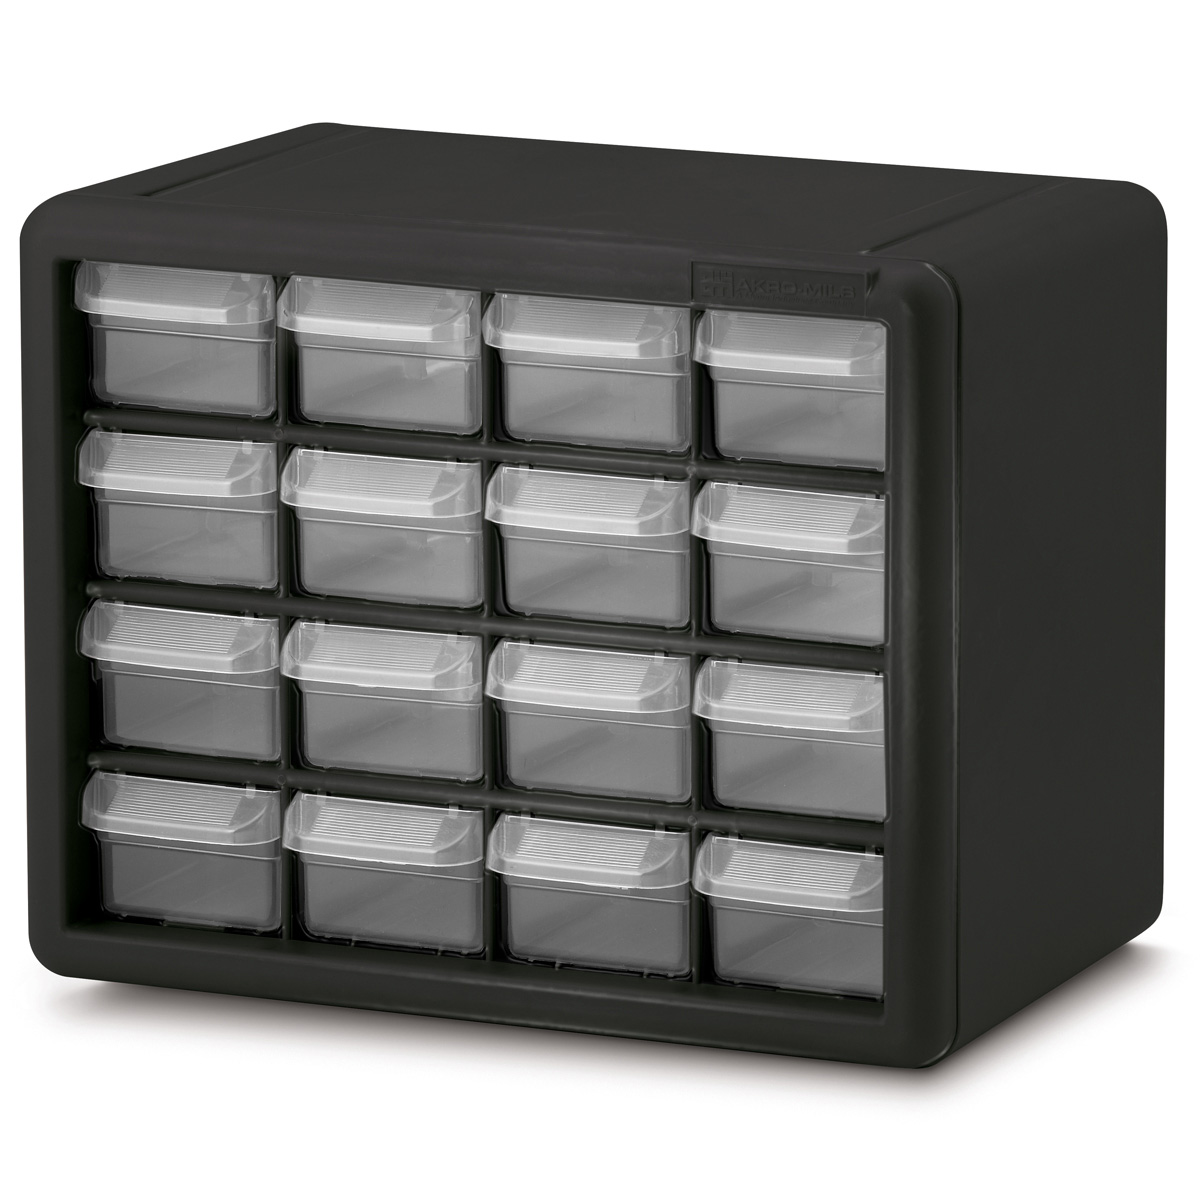 akro mils 10124 24 drawer plastic frame storage cabinet